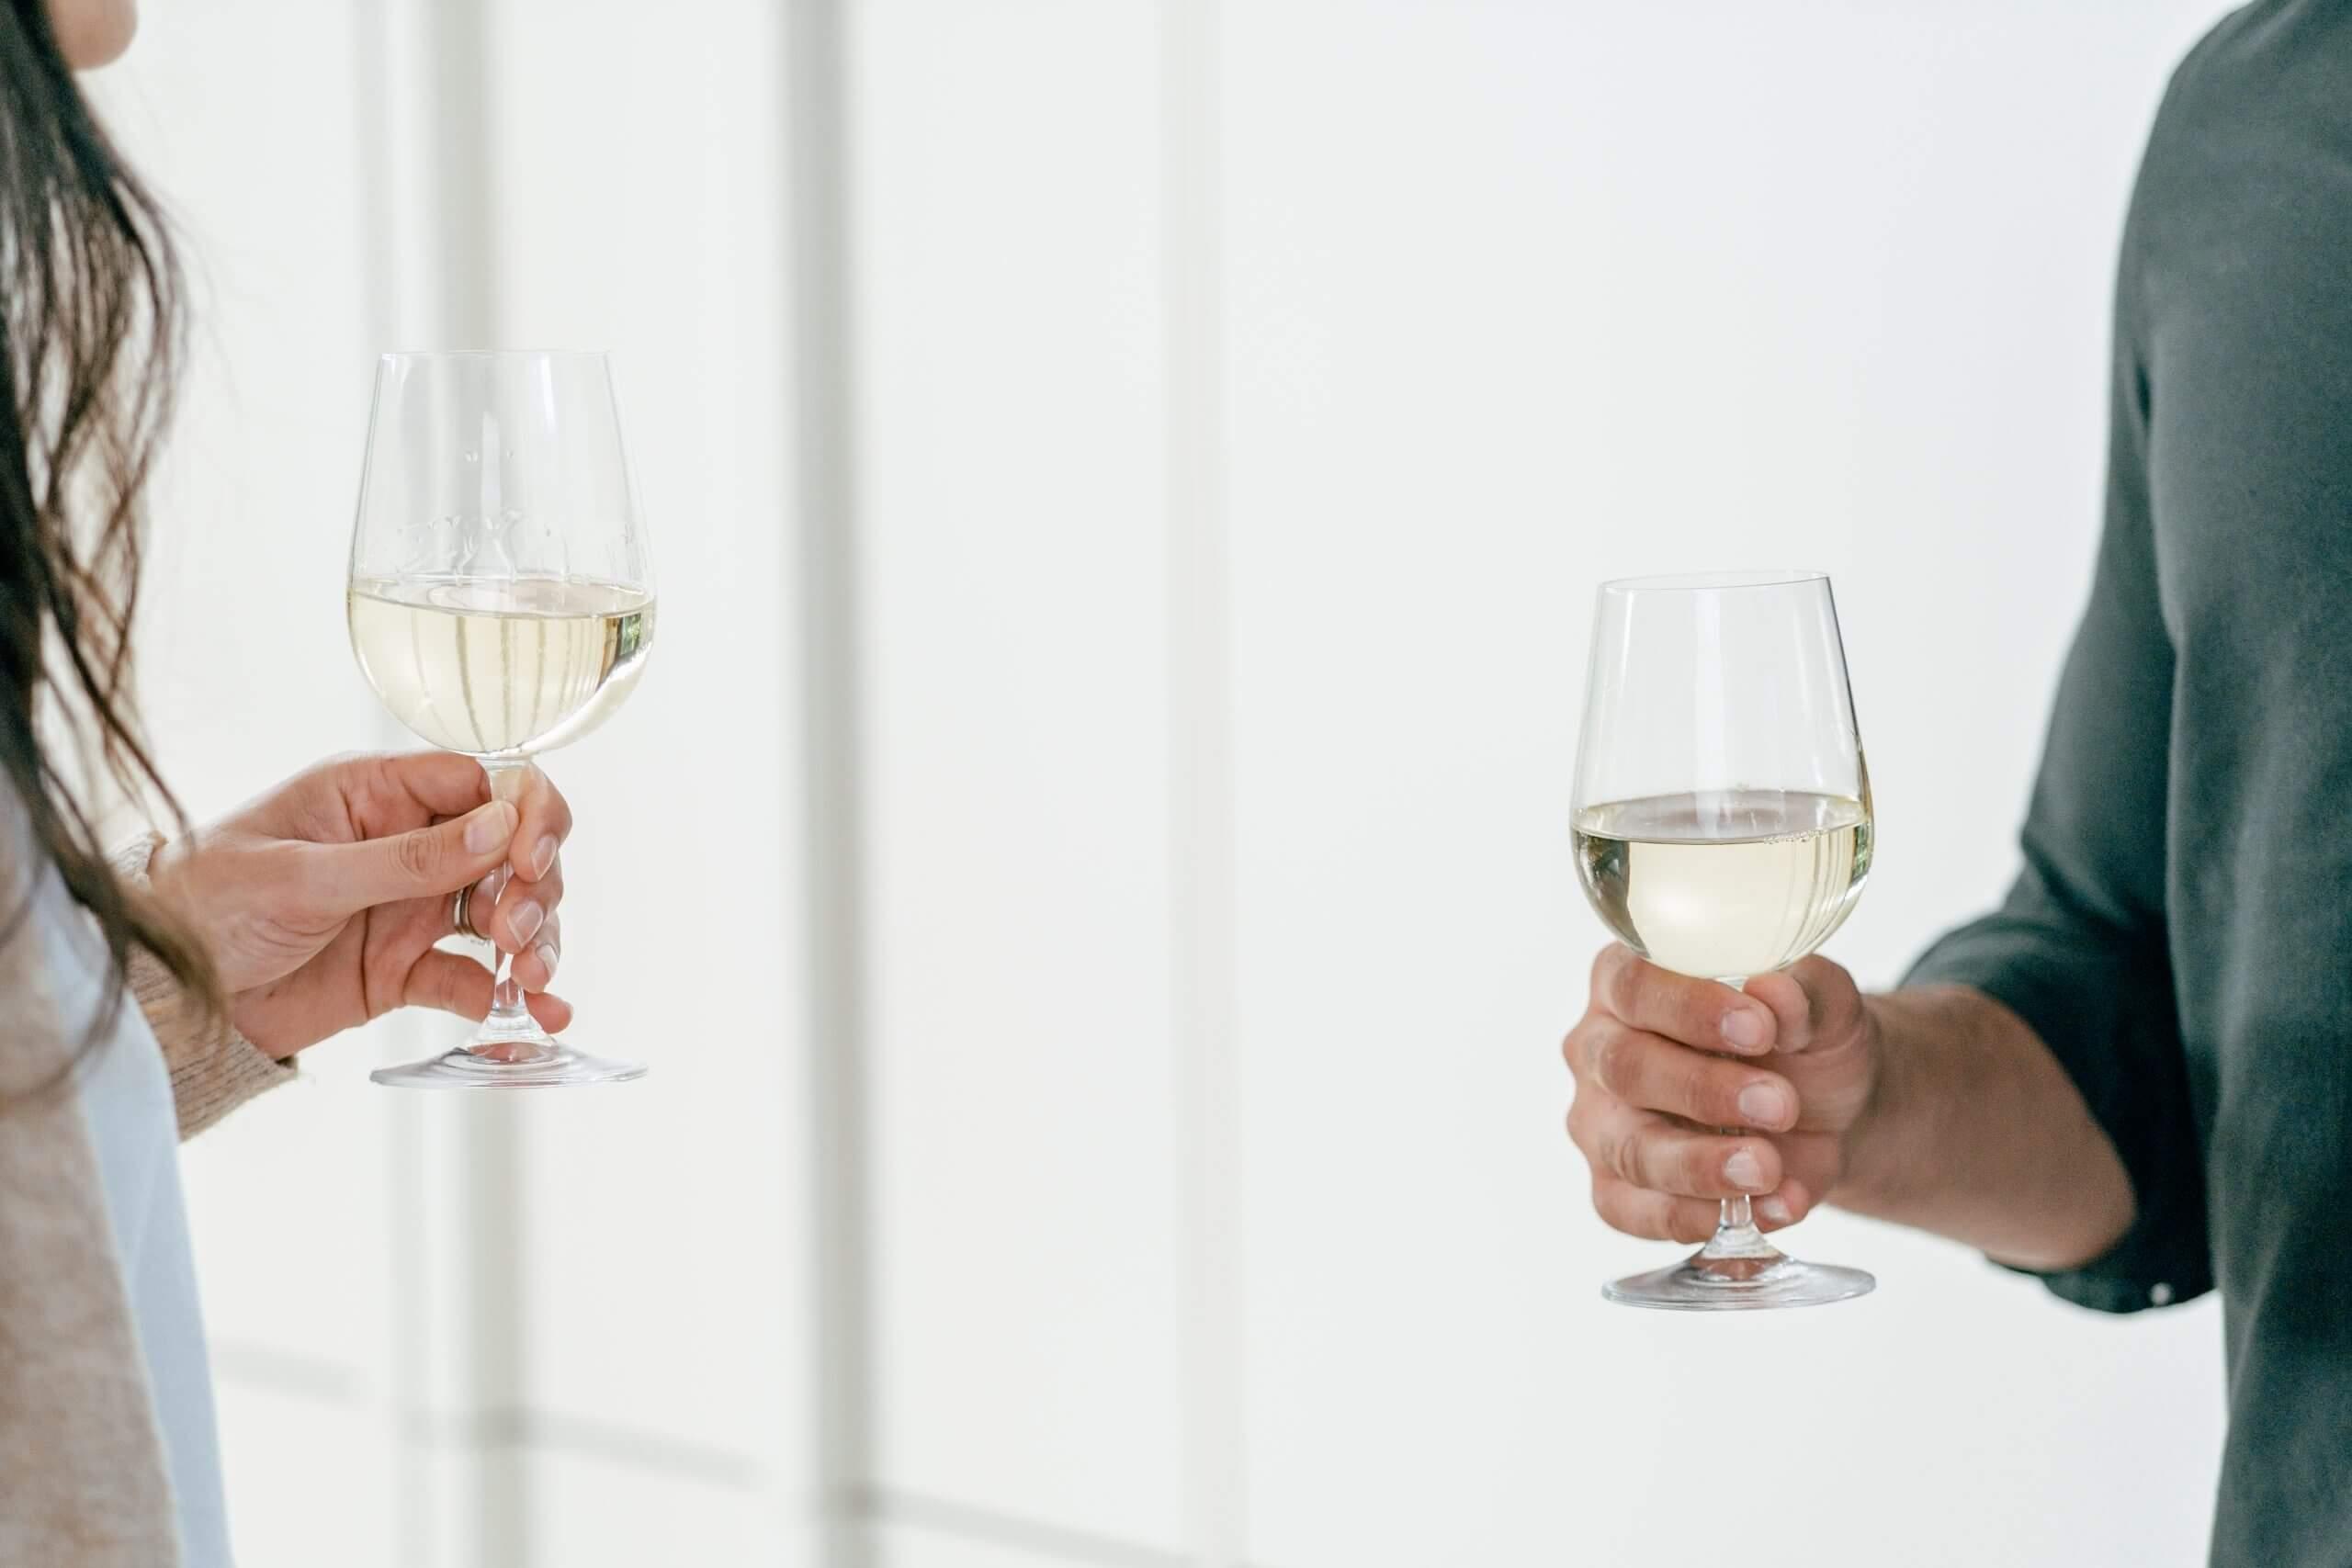 Stoneleigh Generic White Wine Glasses